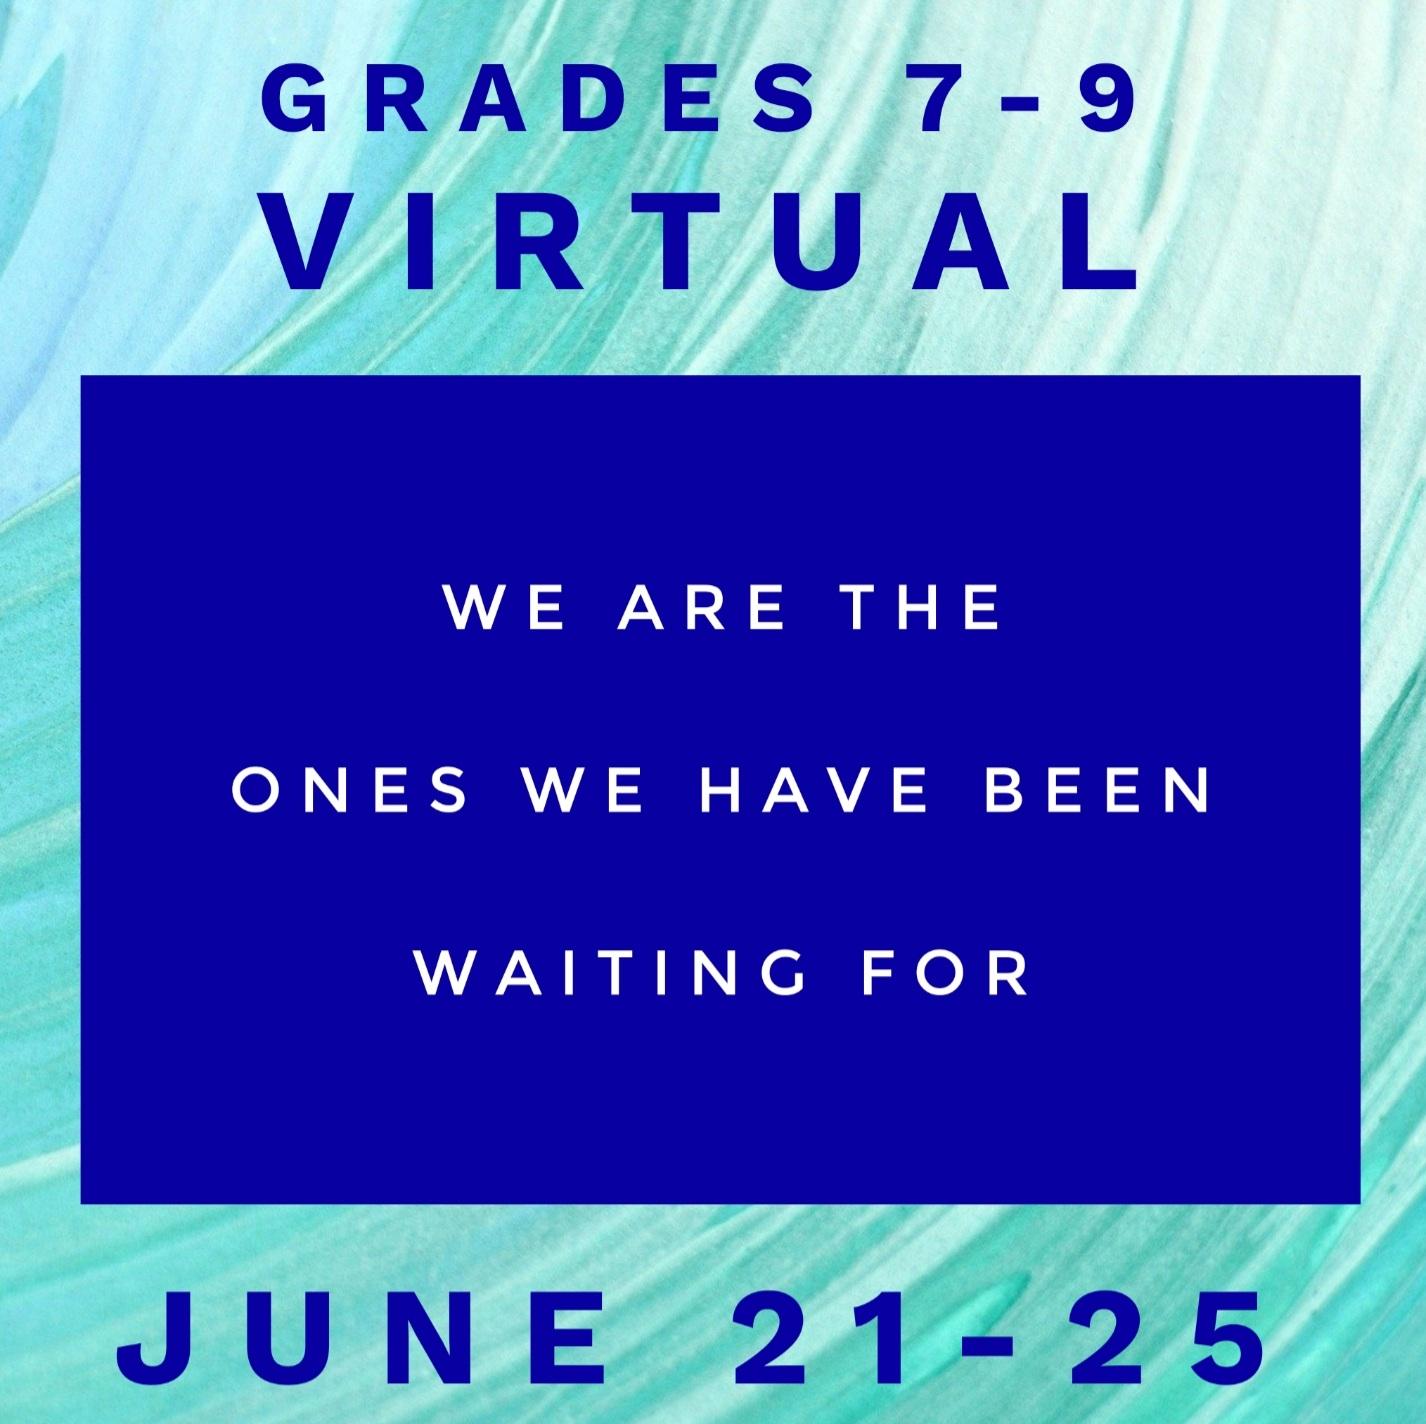 Summer Camp Grade 7-9 Virtual Image